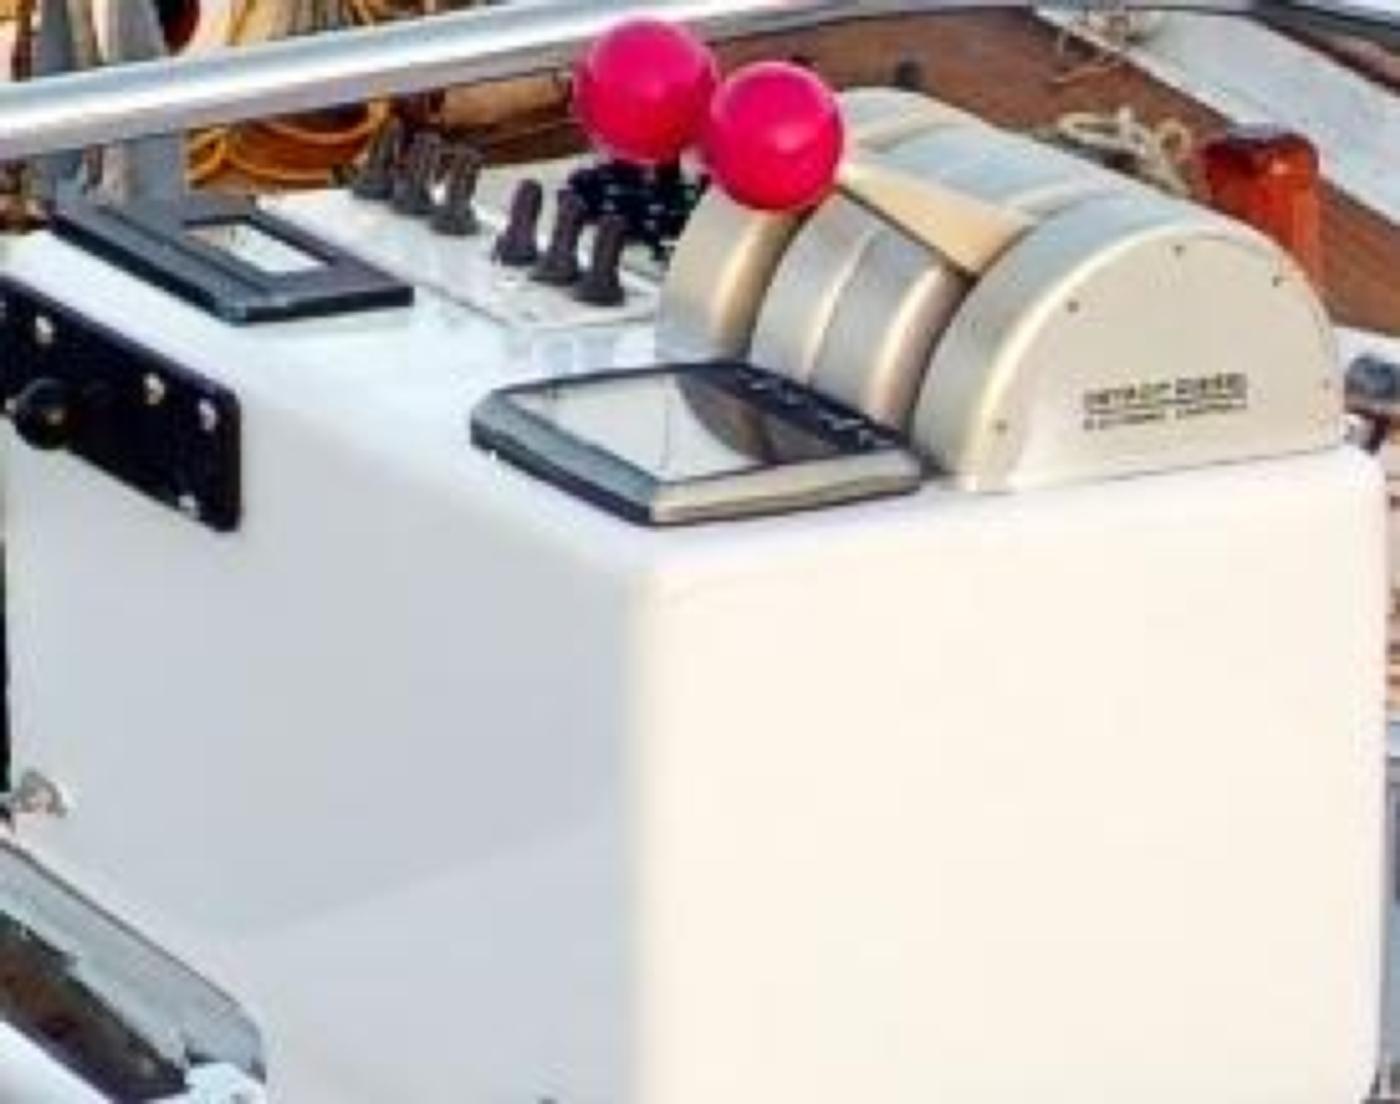 1997 Nordlund Motoryacht, Aft boat deck docking controls